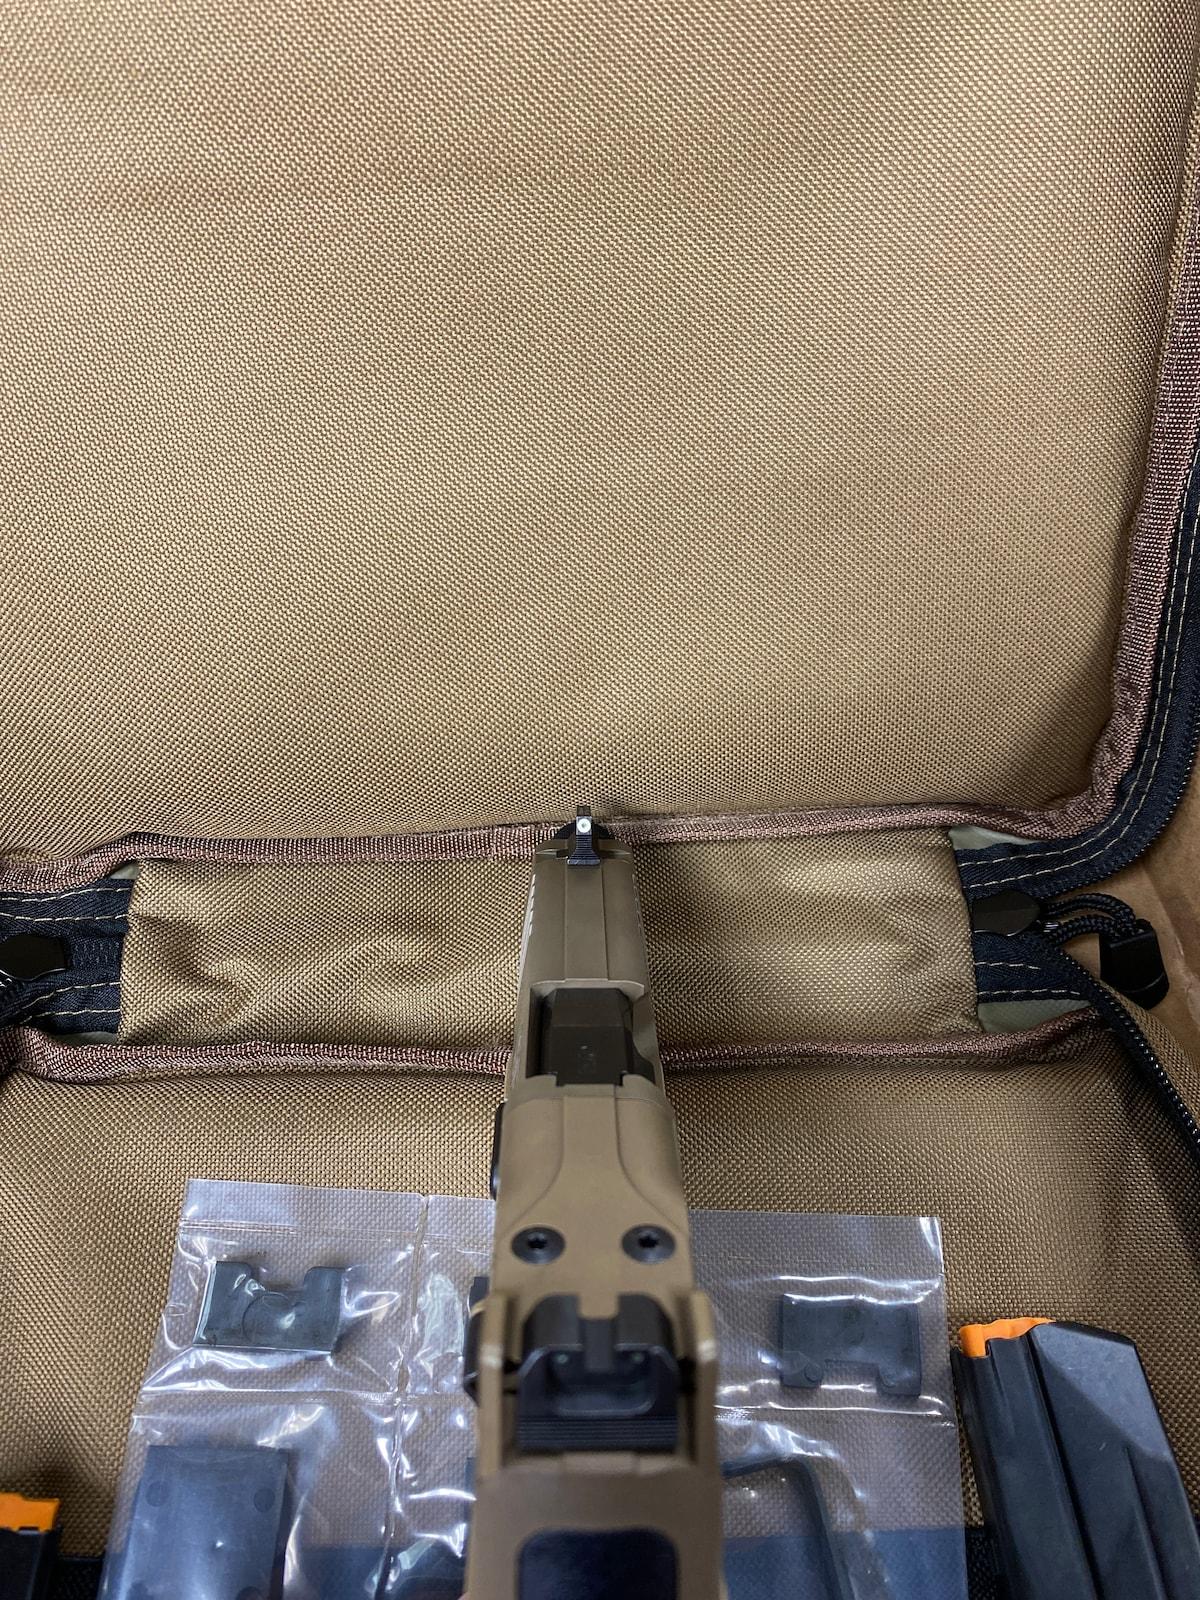 FN America 509C TACTICAL  66-100780